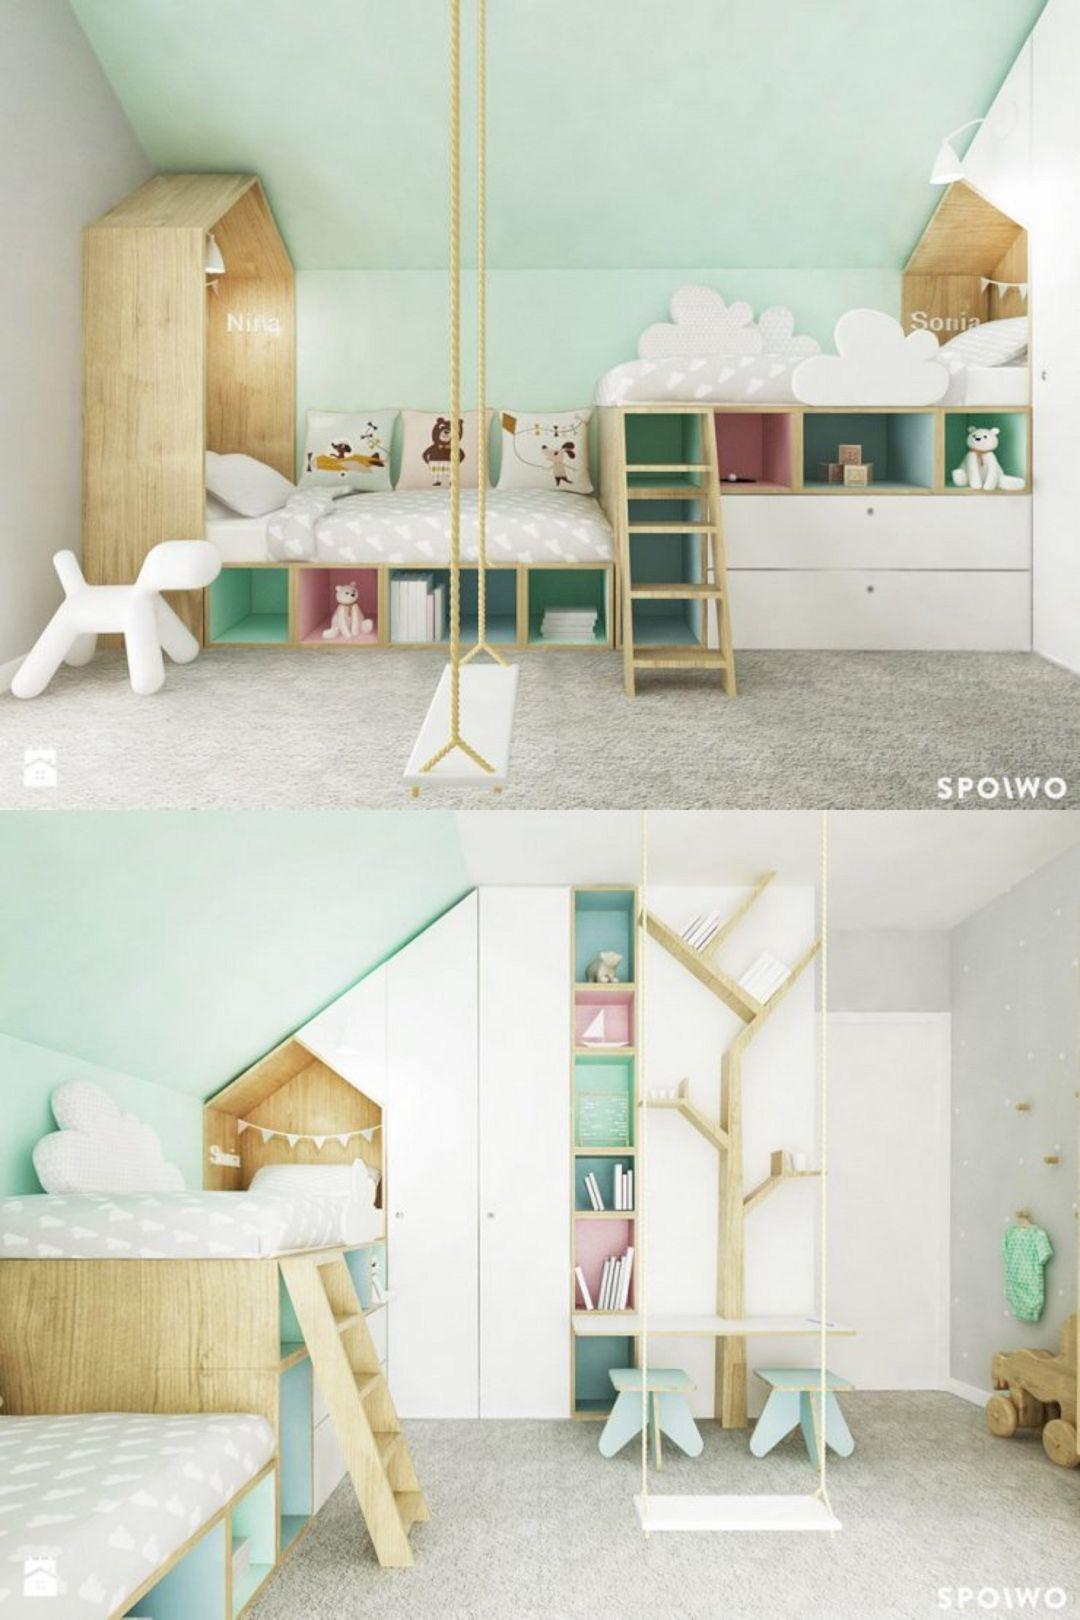 17 Stunning Interior Design Ideas For Living Room Kids Room